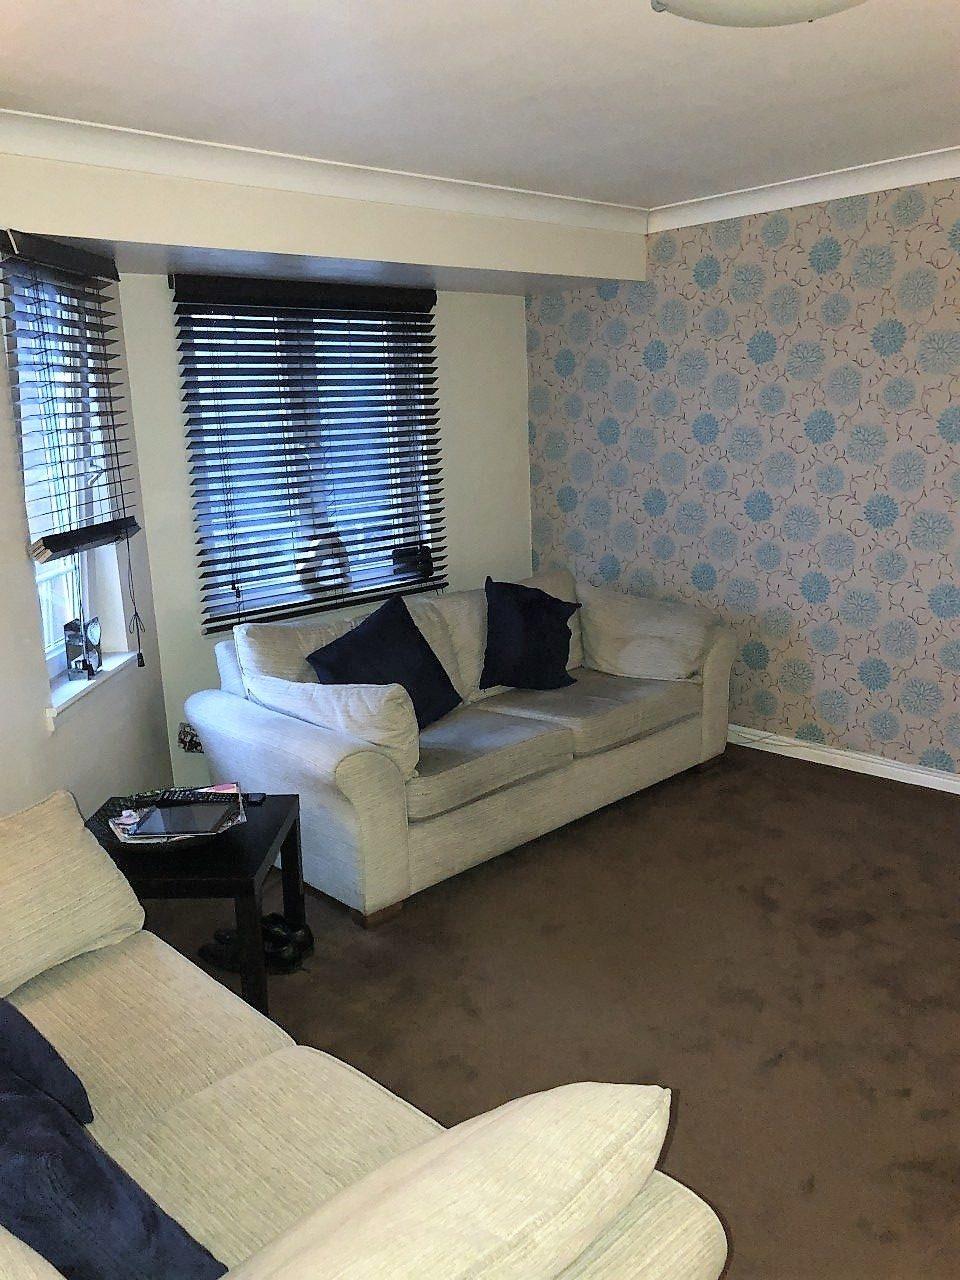 2 Bedroom Suites In Savannah Ga: Modern 2 Bedroom Top Floor Apartment With En-Suite